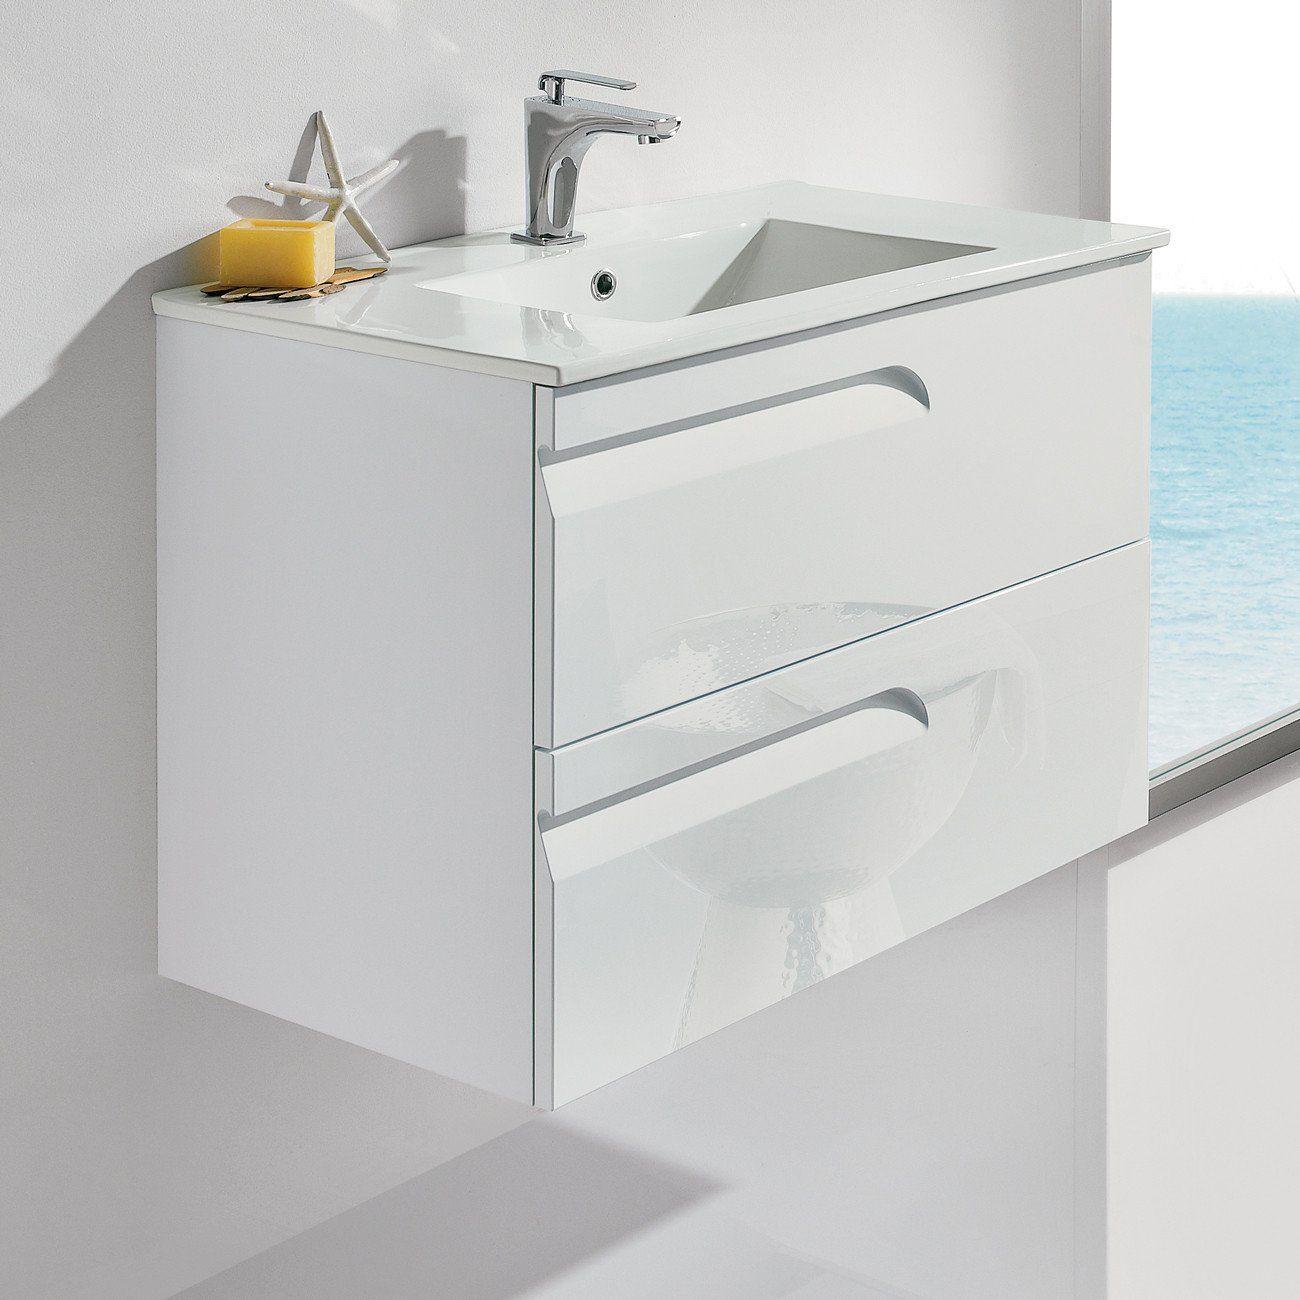 Royo Vitale Premium Bathroom Wall-hung Vanity - Cabinet and Sink 24 ...